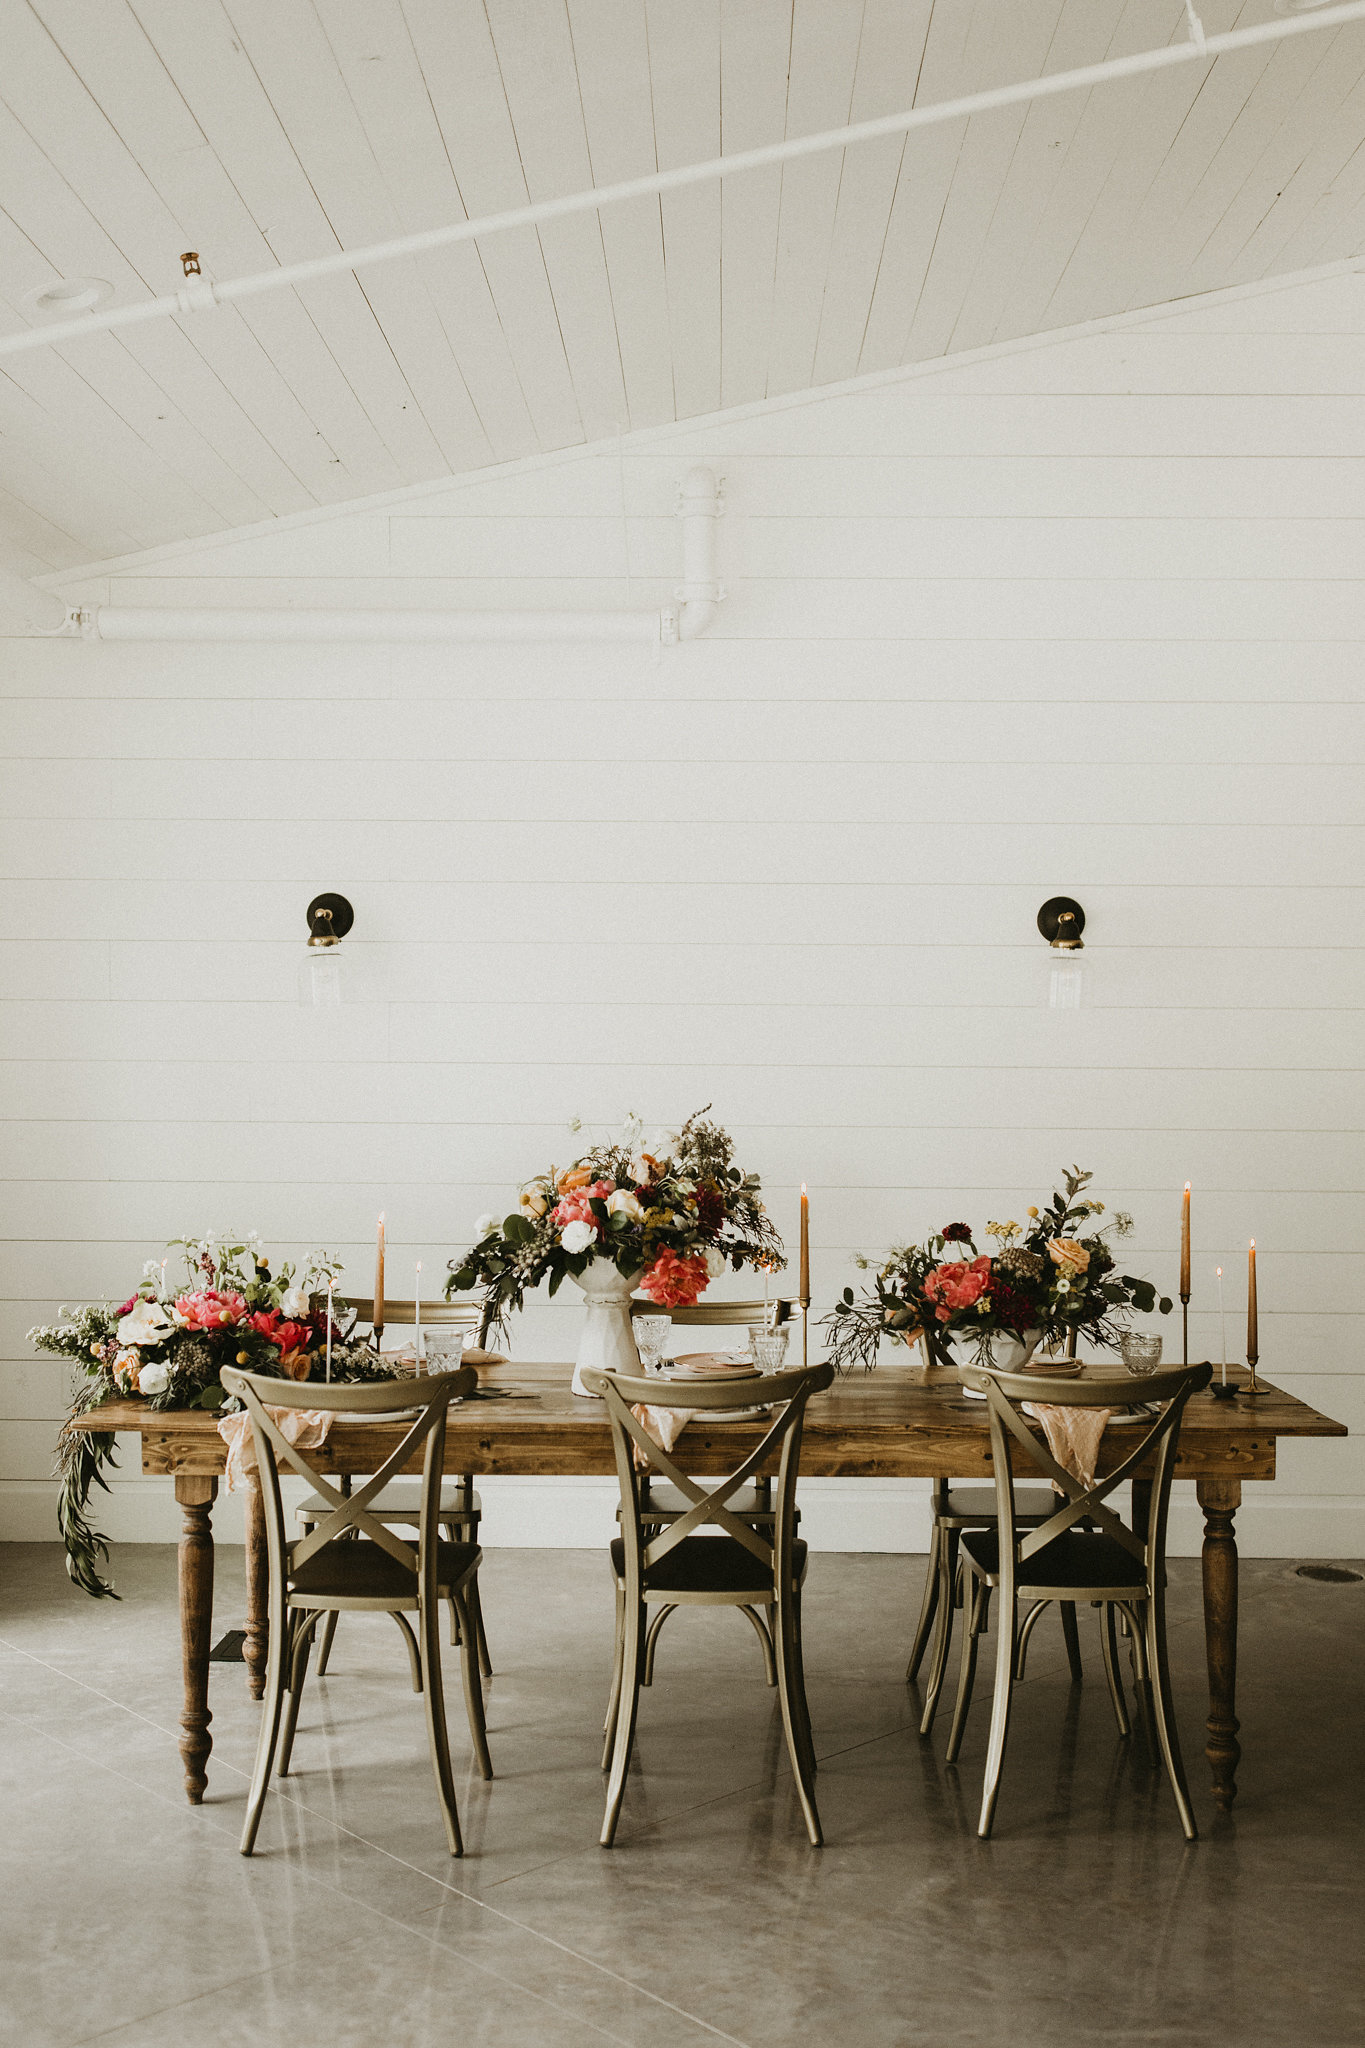 colorful wedding tabletop design - meekermark wedding venue - epoch co wedding planner